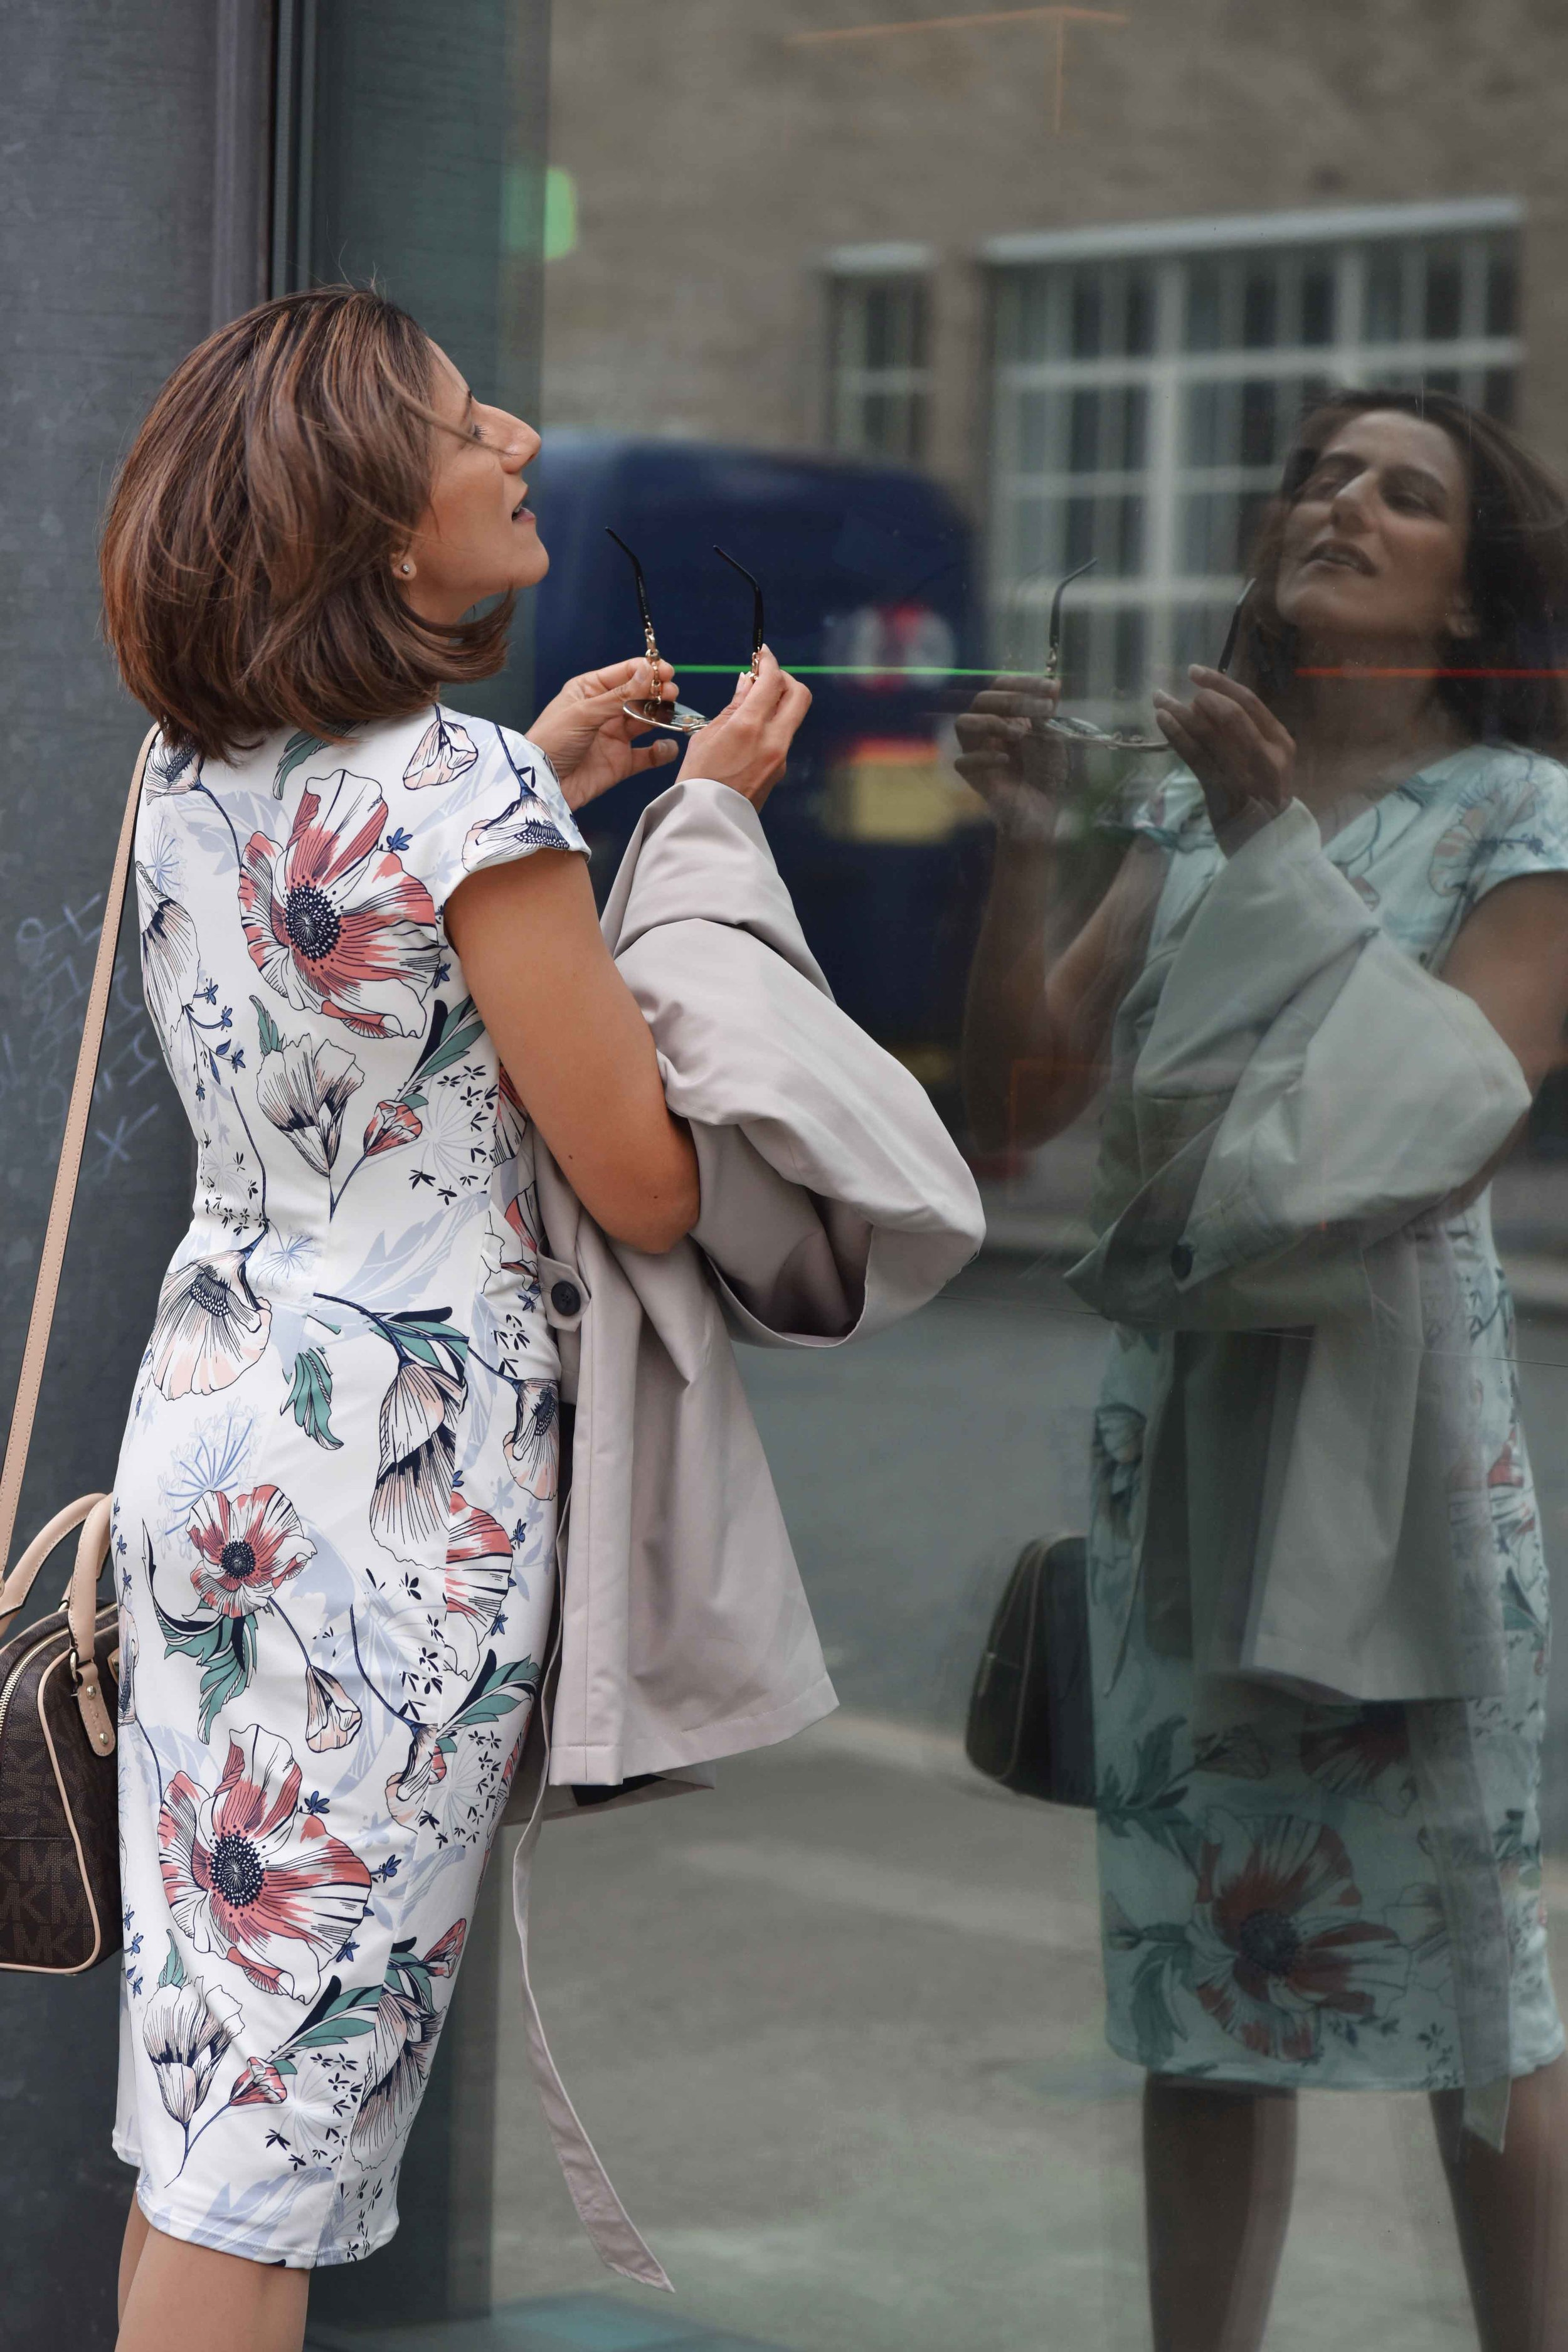 Marks and Spencer shift dress, Marks and Spencer trench, Gucci sunglasses, Michael Kors handbag, street fashion, Shoreditch, London, U.K. Photo: Nina Shaw, Image©sourcingstyle.com